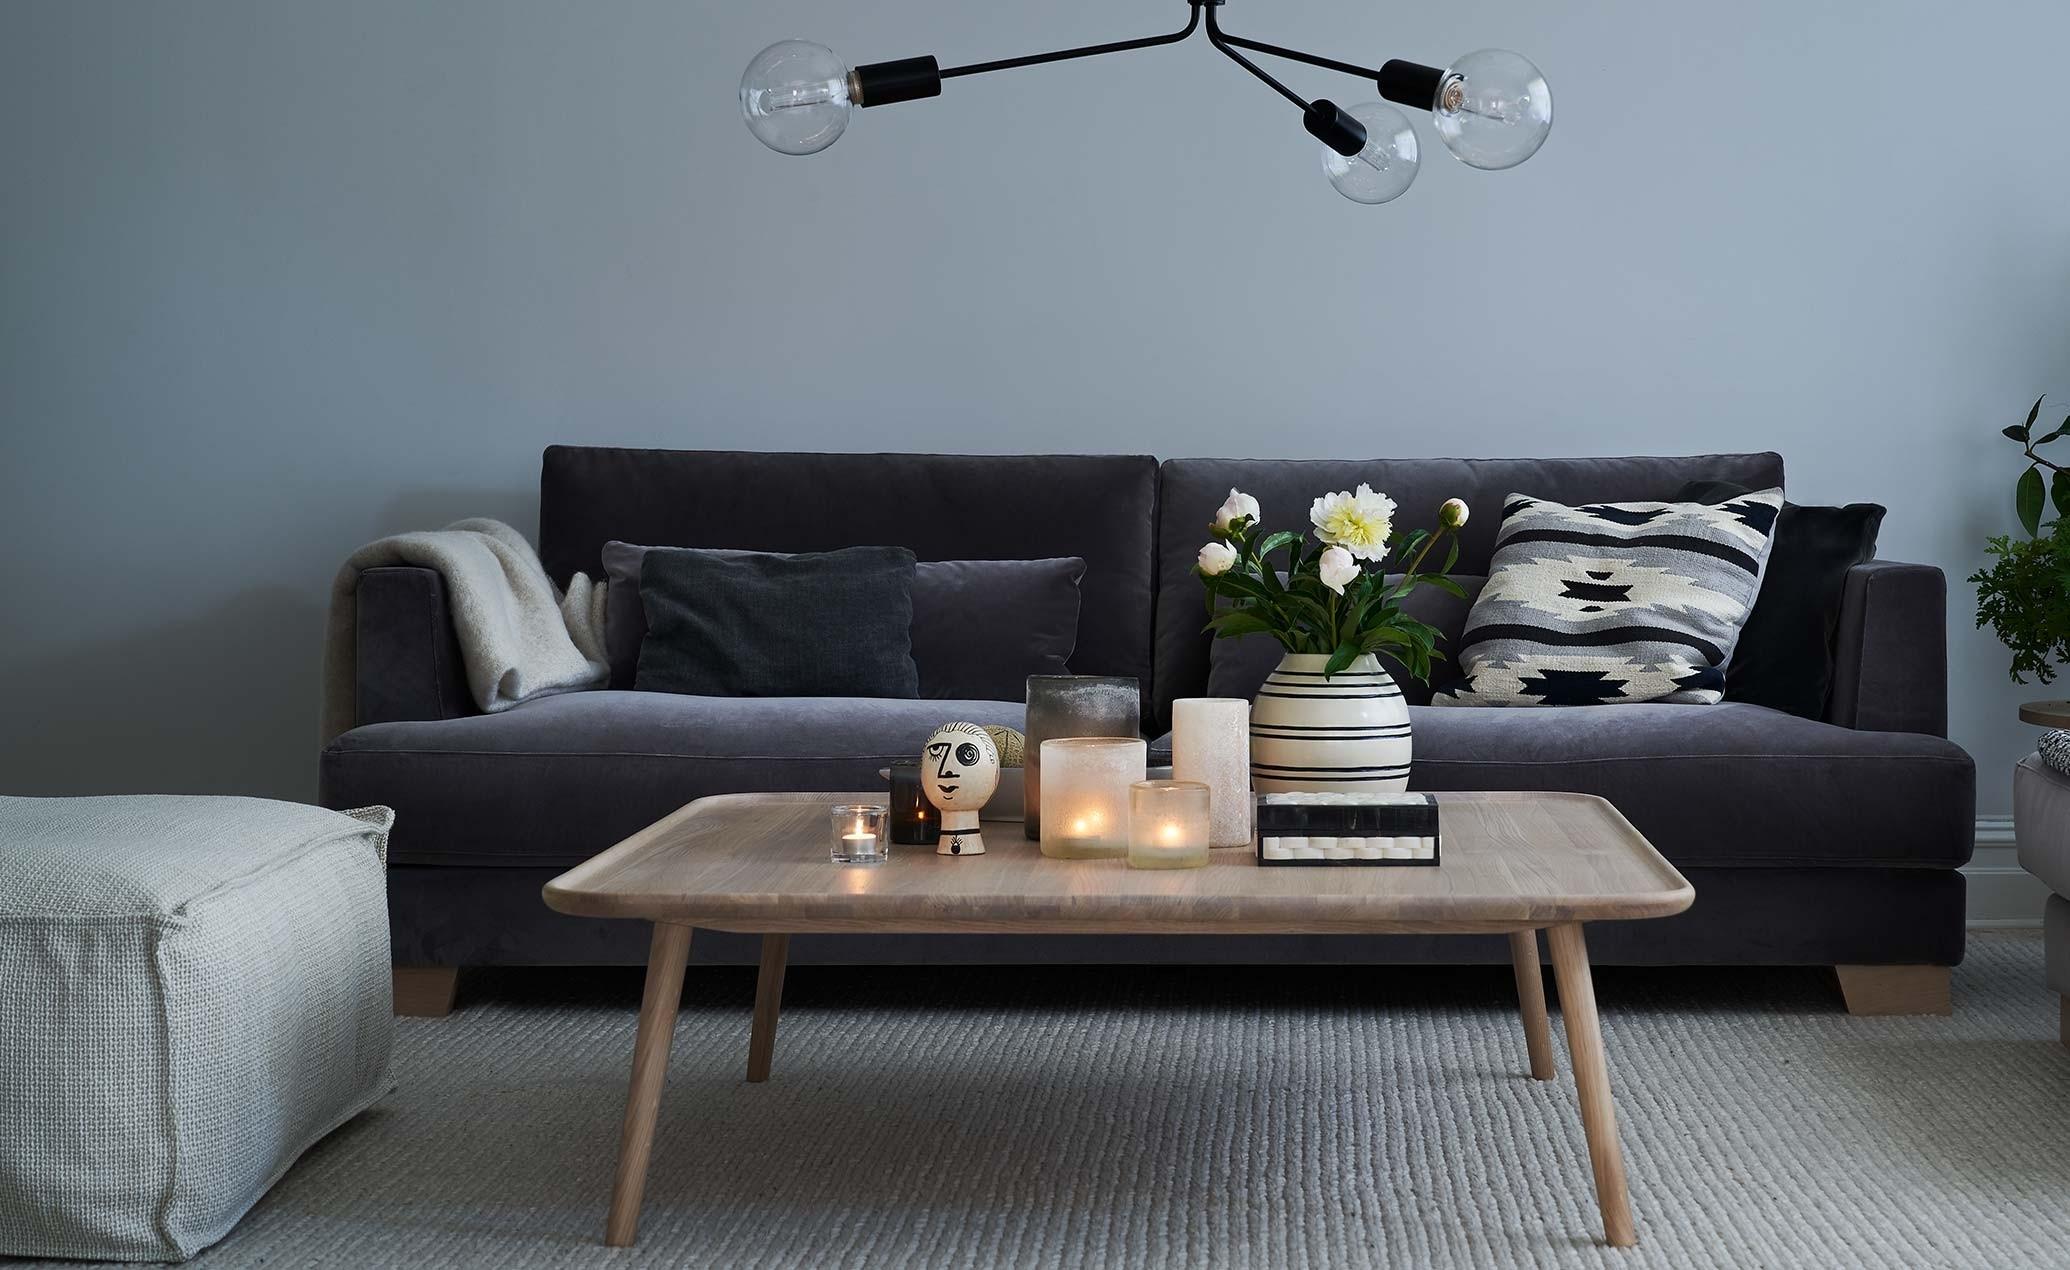 Hammett 3 seater sofa